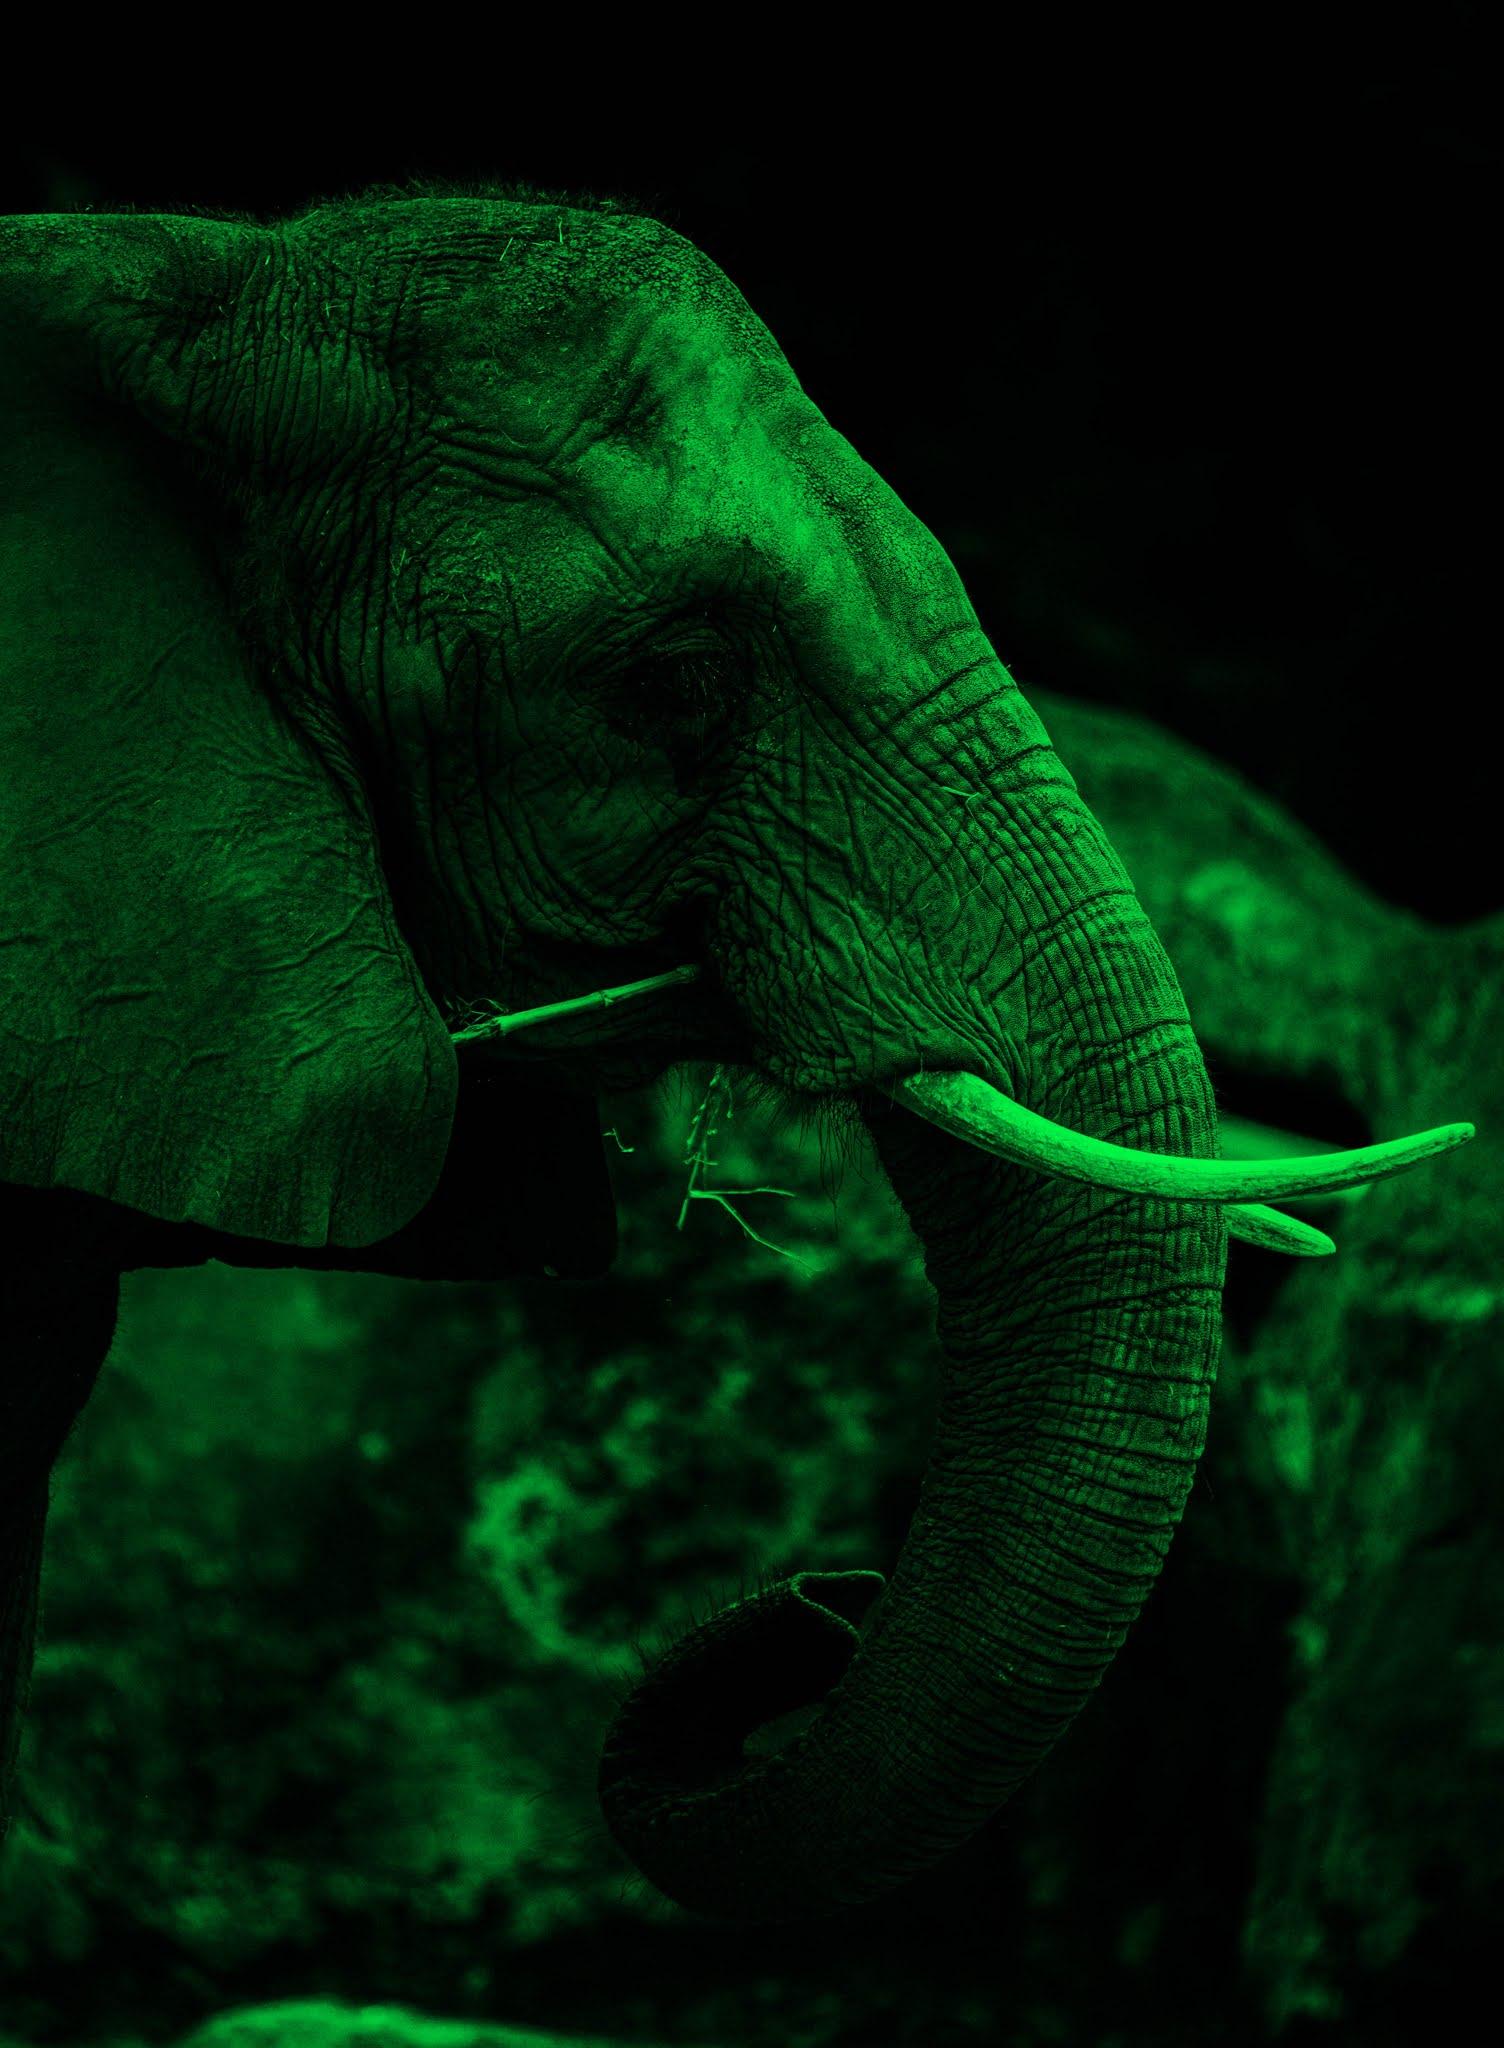 Green light elephant photo